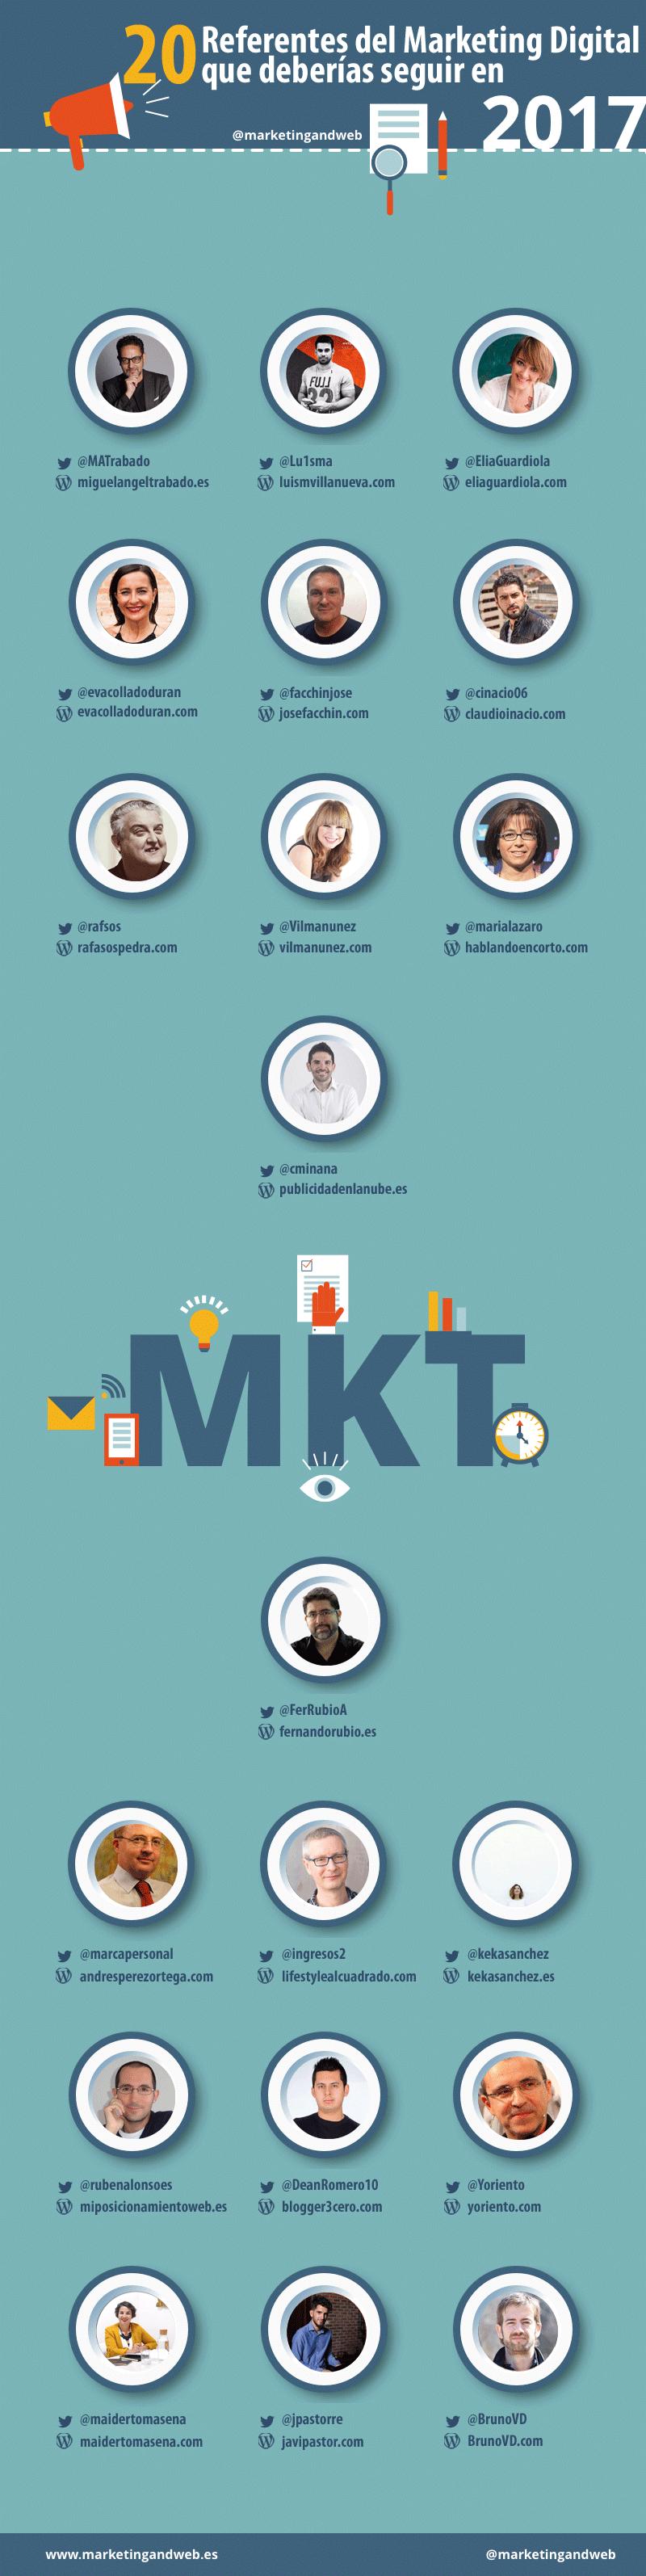 referentes del marketing digital infografia